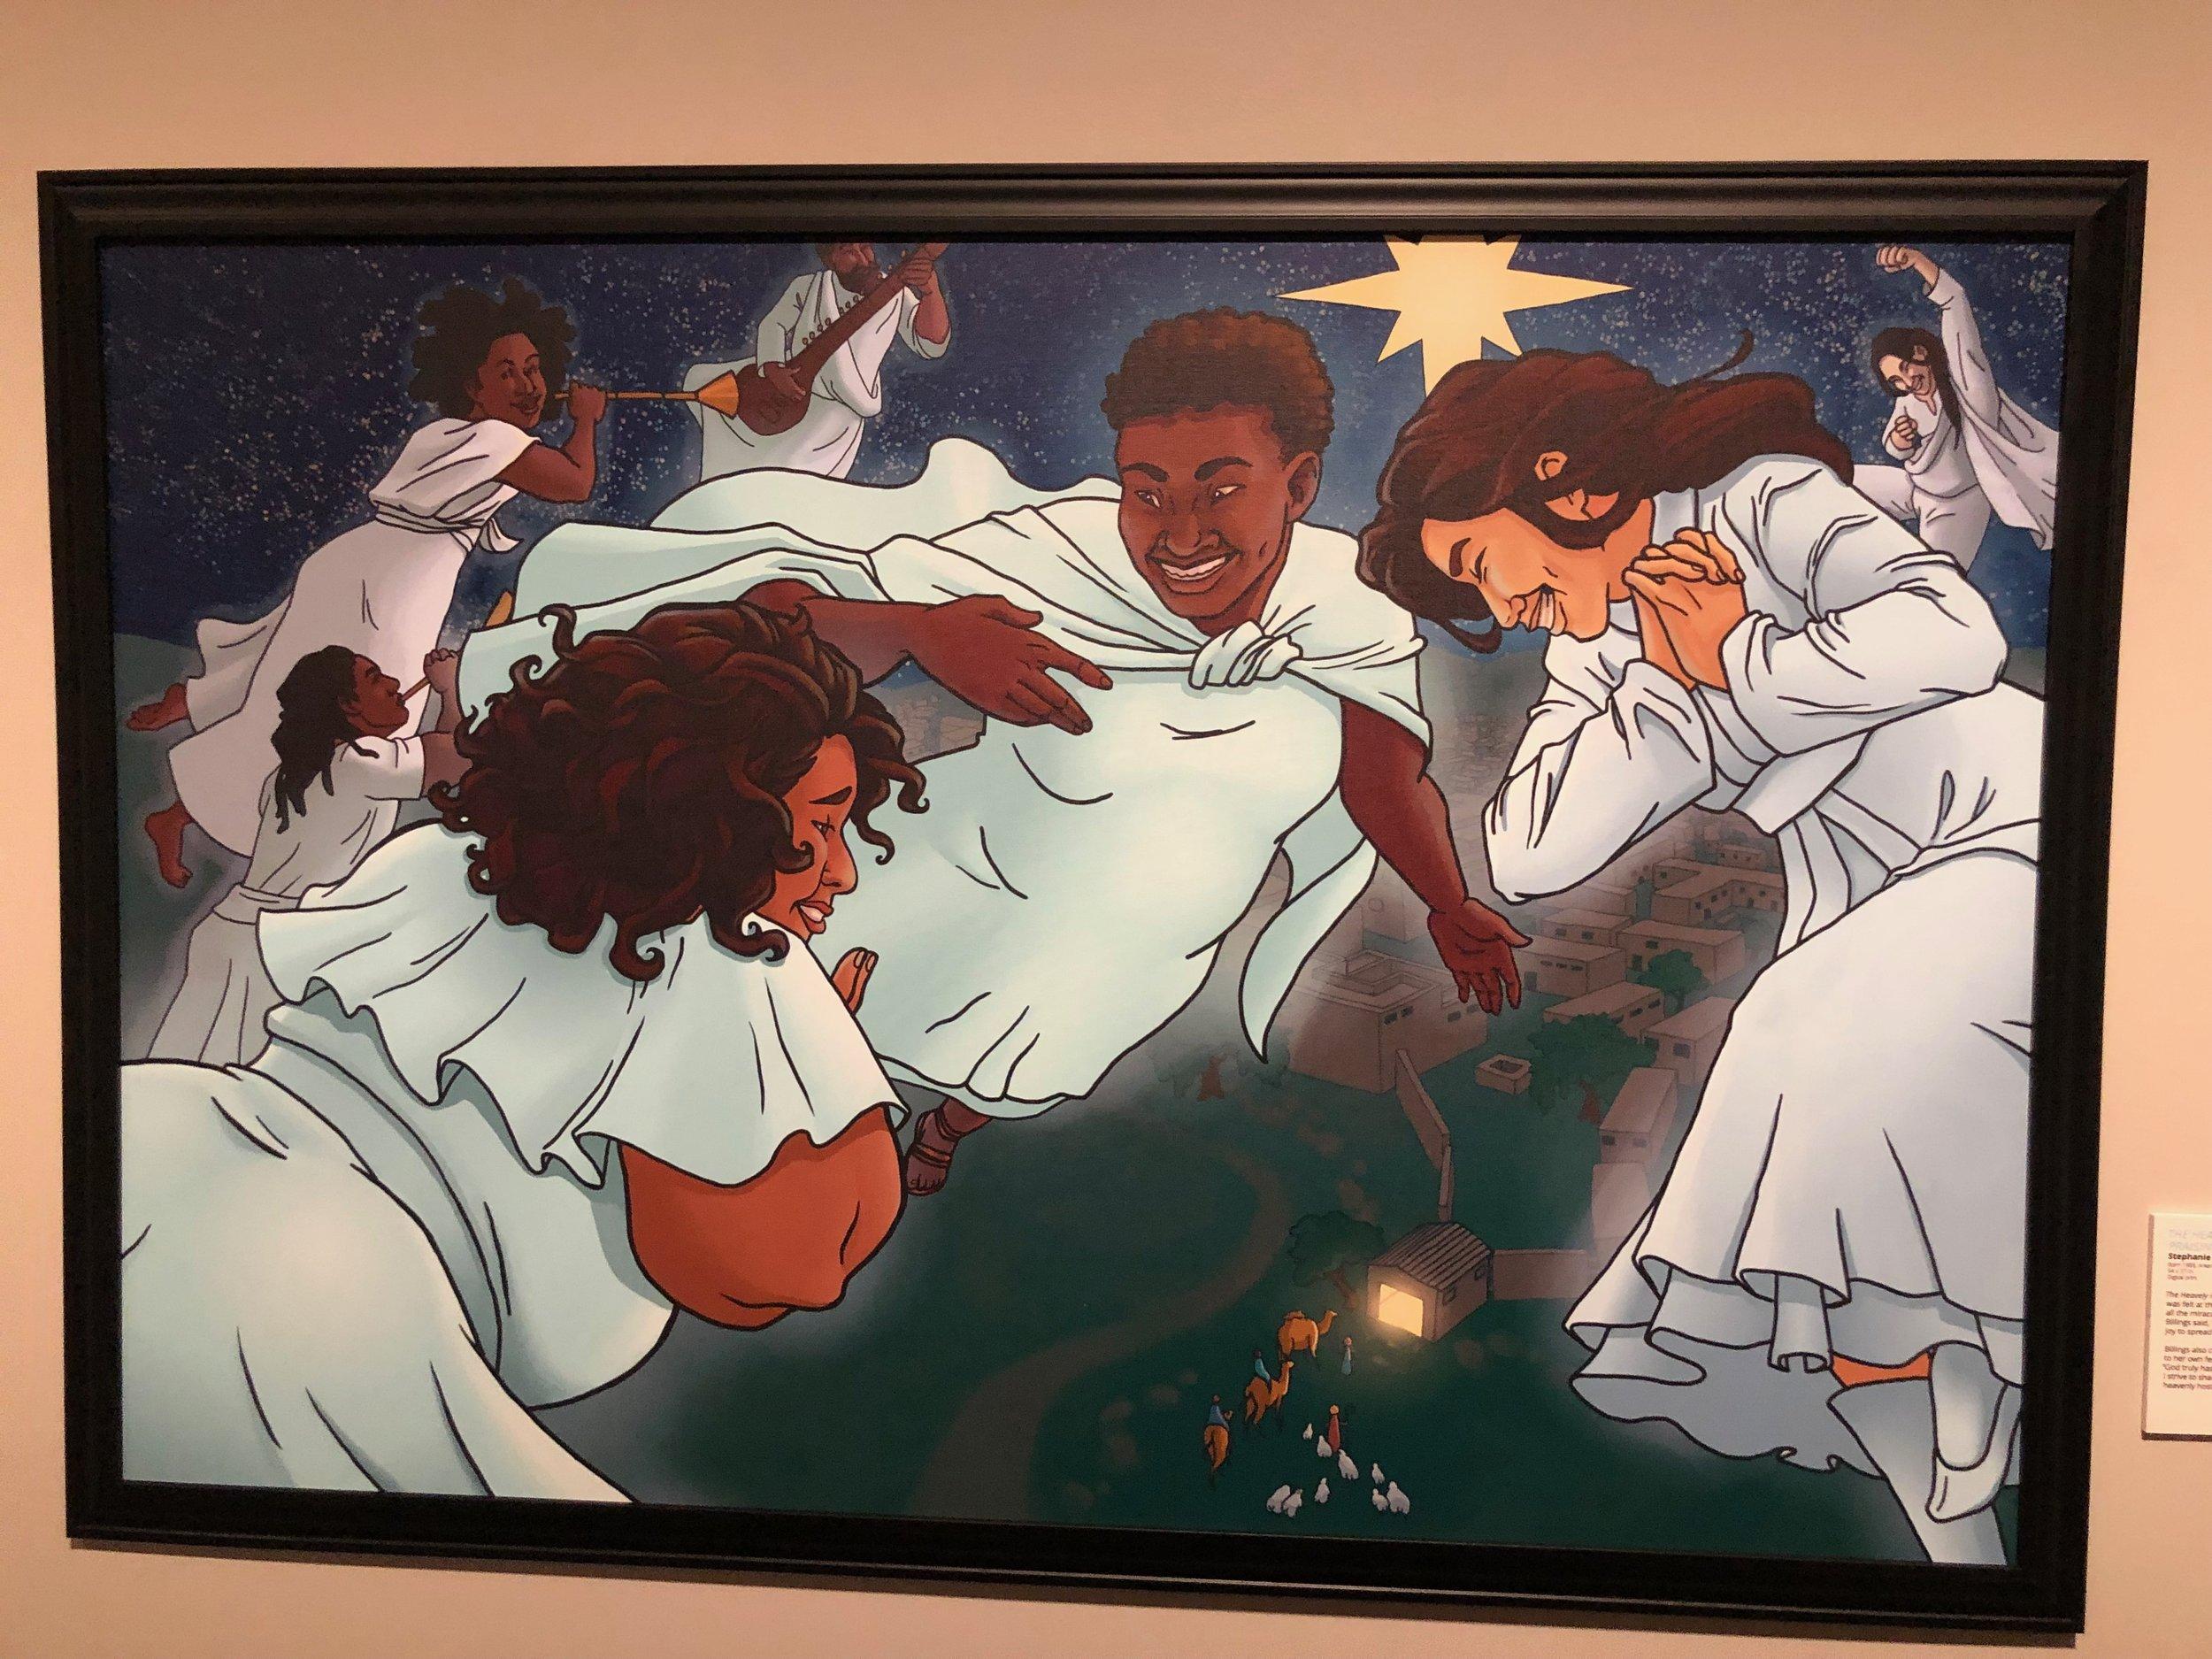 The Heavenly Host Praising God  by Stephanie Billings. Digital print.